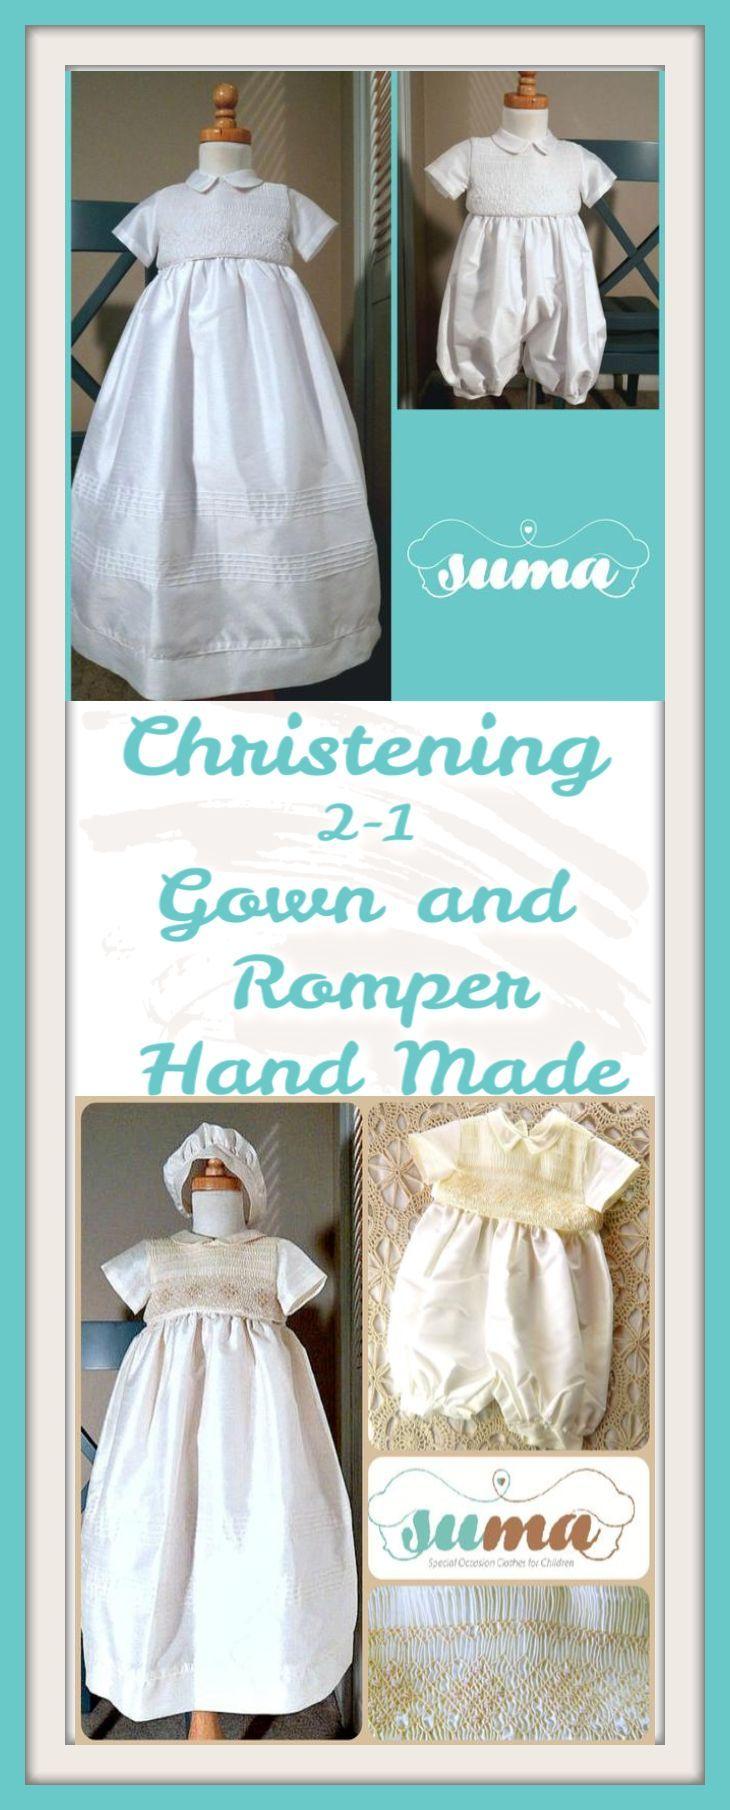 636347bec Christening Outfit Boy, white Christening Outfit baby Boy, Christening  Romper, Christening Baptism, Baptism outfit boy, Baptism outfit baby, Baptism  Romper, ...